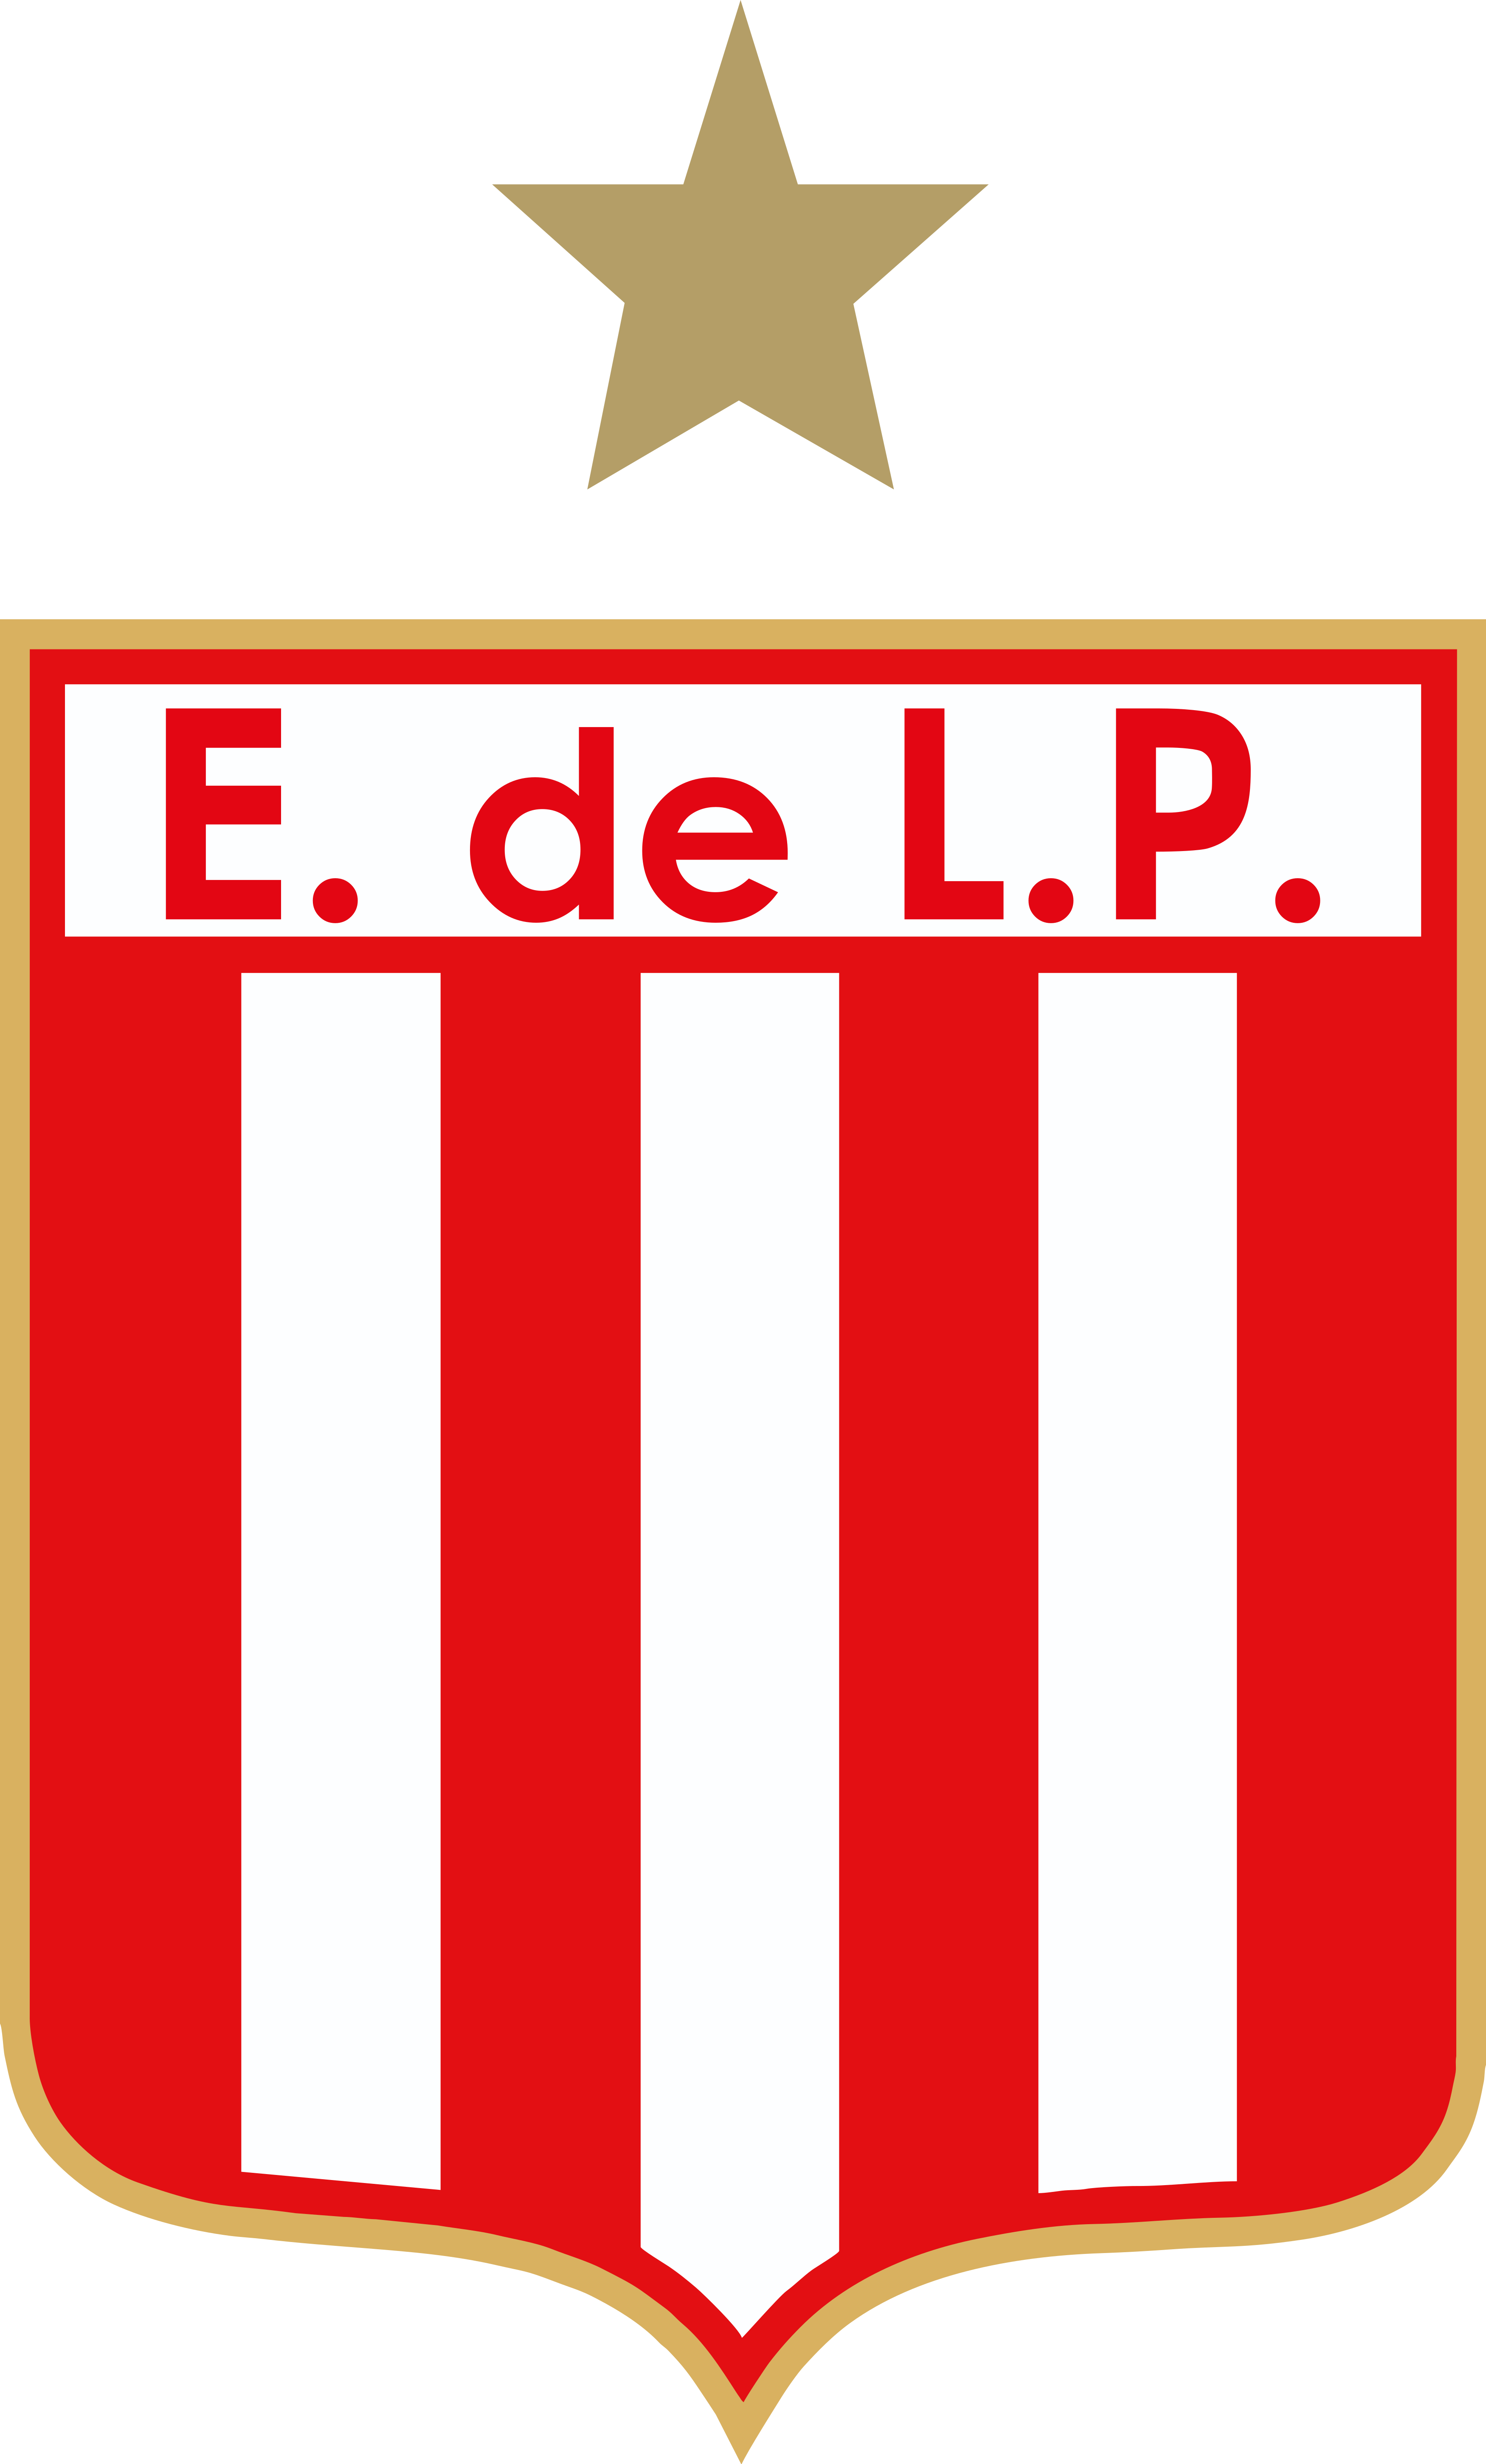 estudiantes logo escudo 1 - Estudiantes de La Plata Logo - Escudo